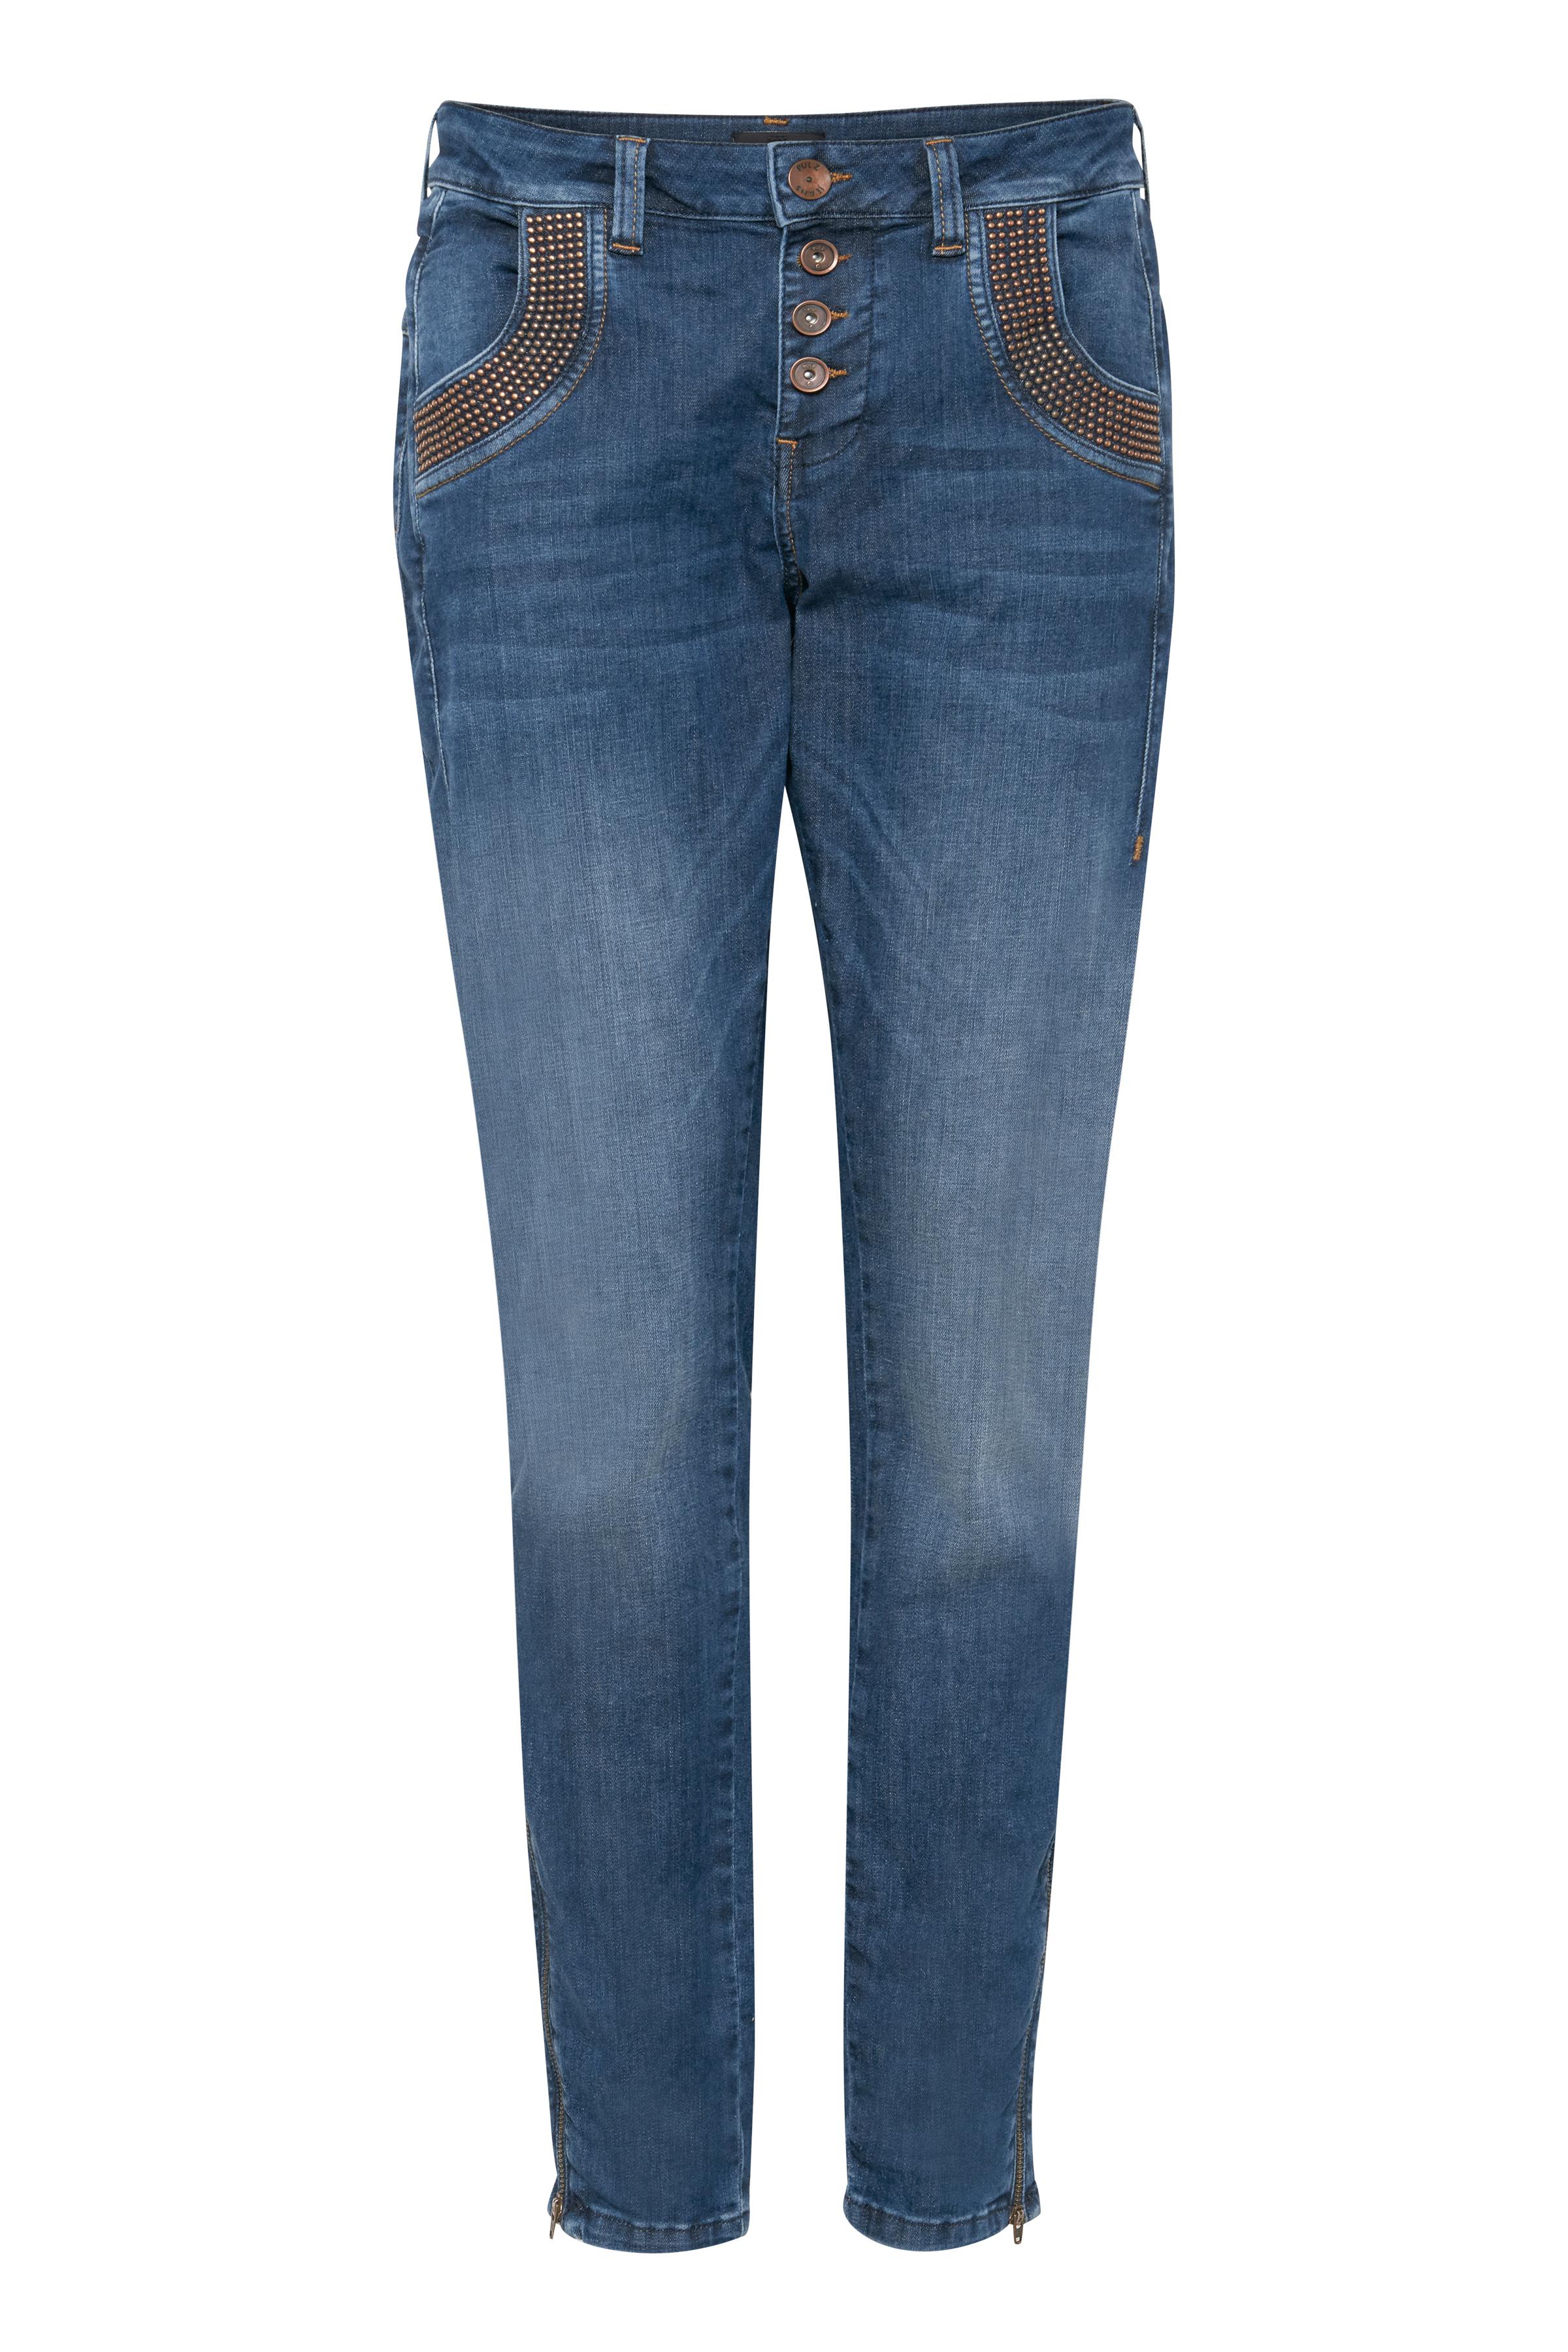 Image of Pulz Jeans Dame Cowboybukser - Denimblå